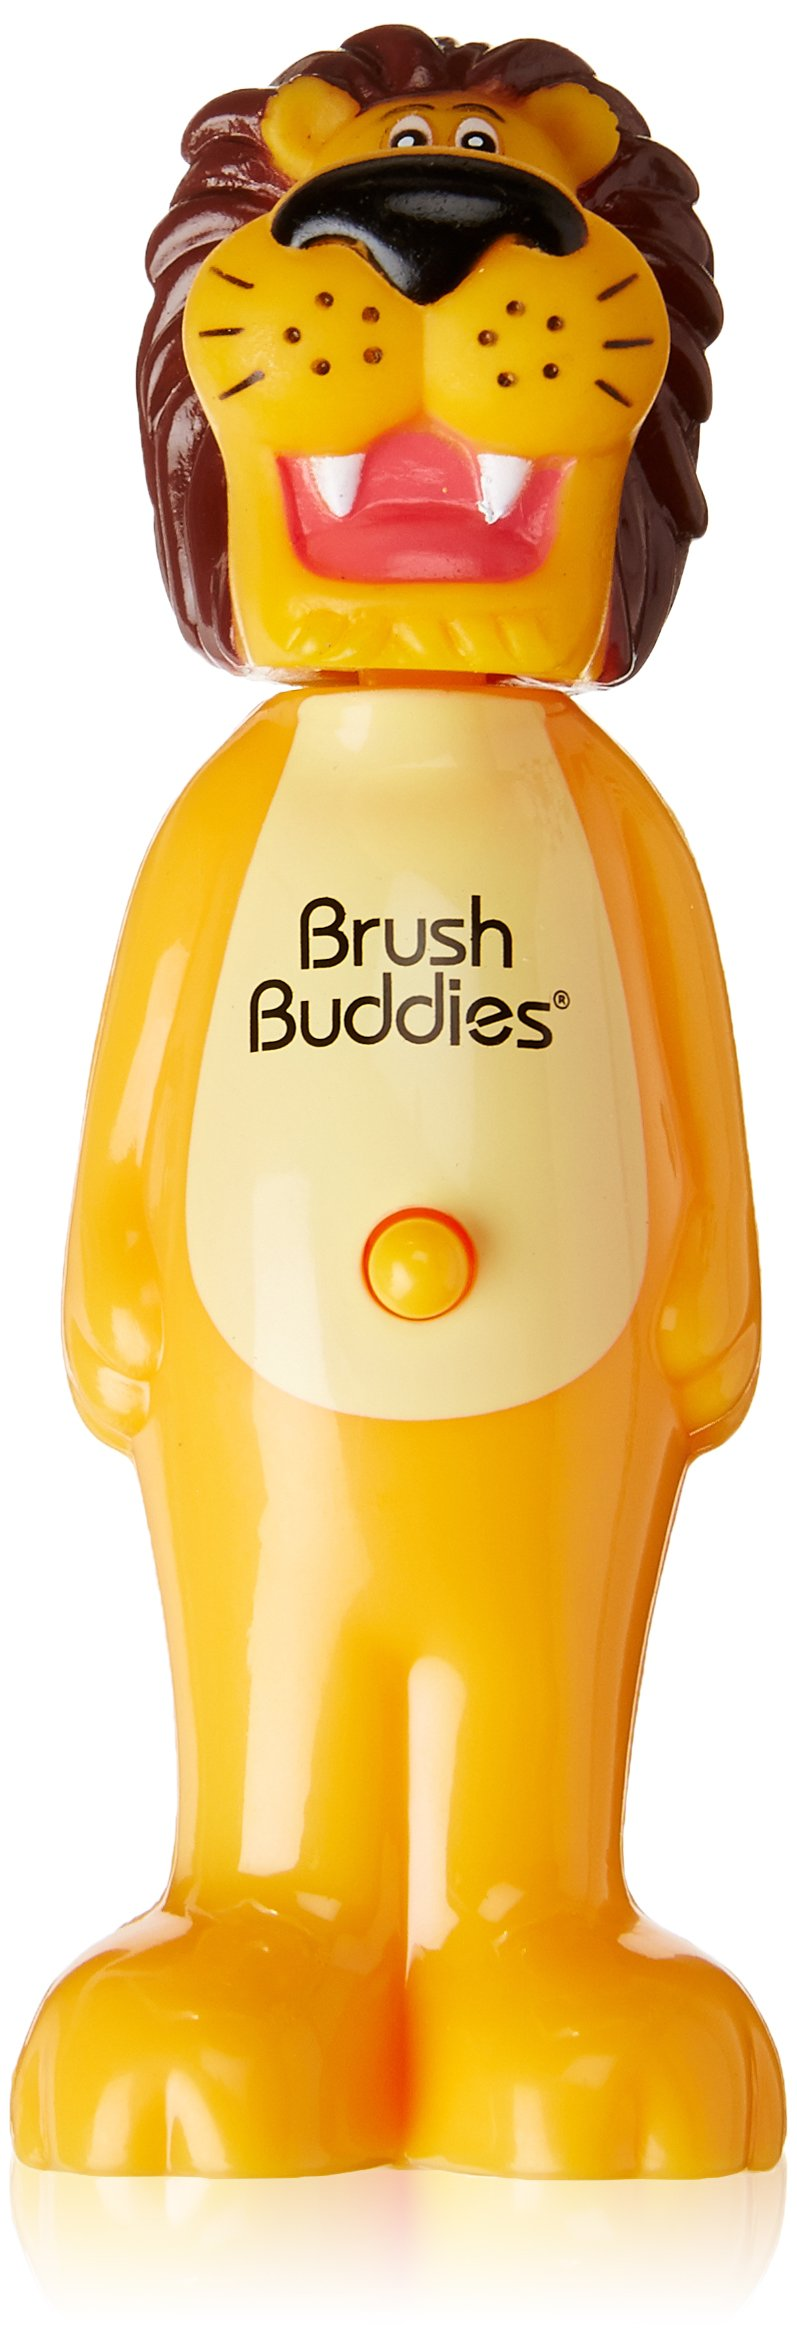 Brush Buddies Rickie Toothbrush